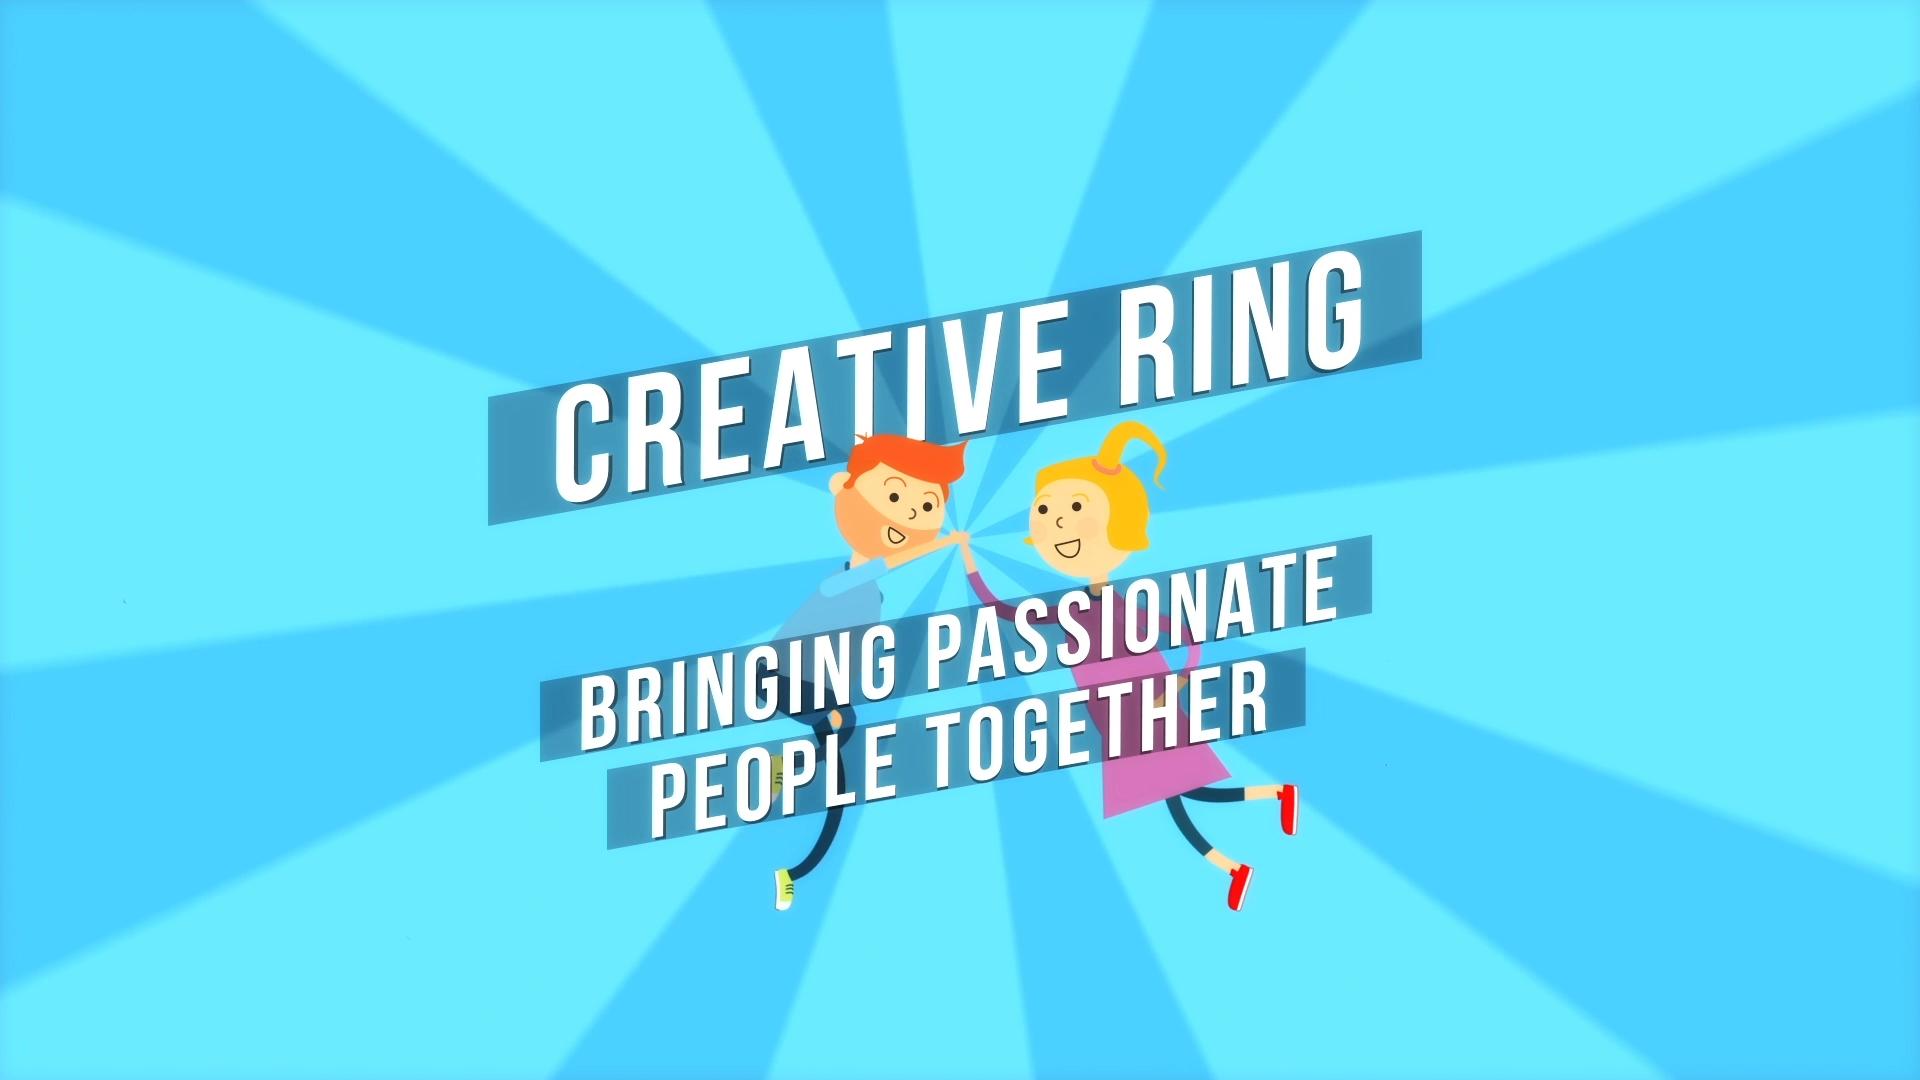 Creative-ring-1